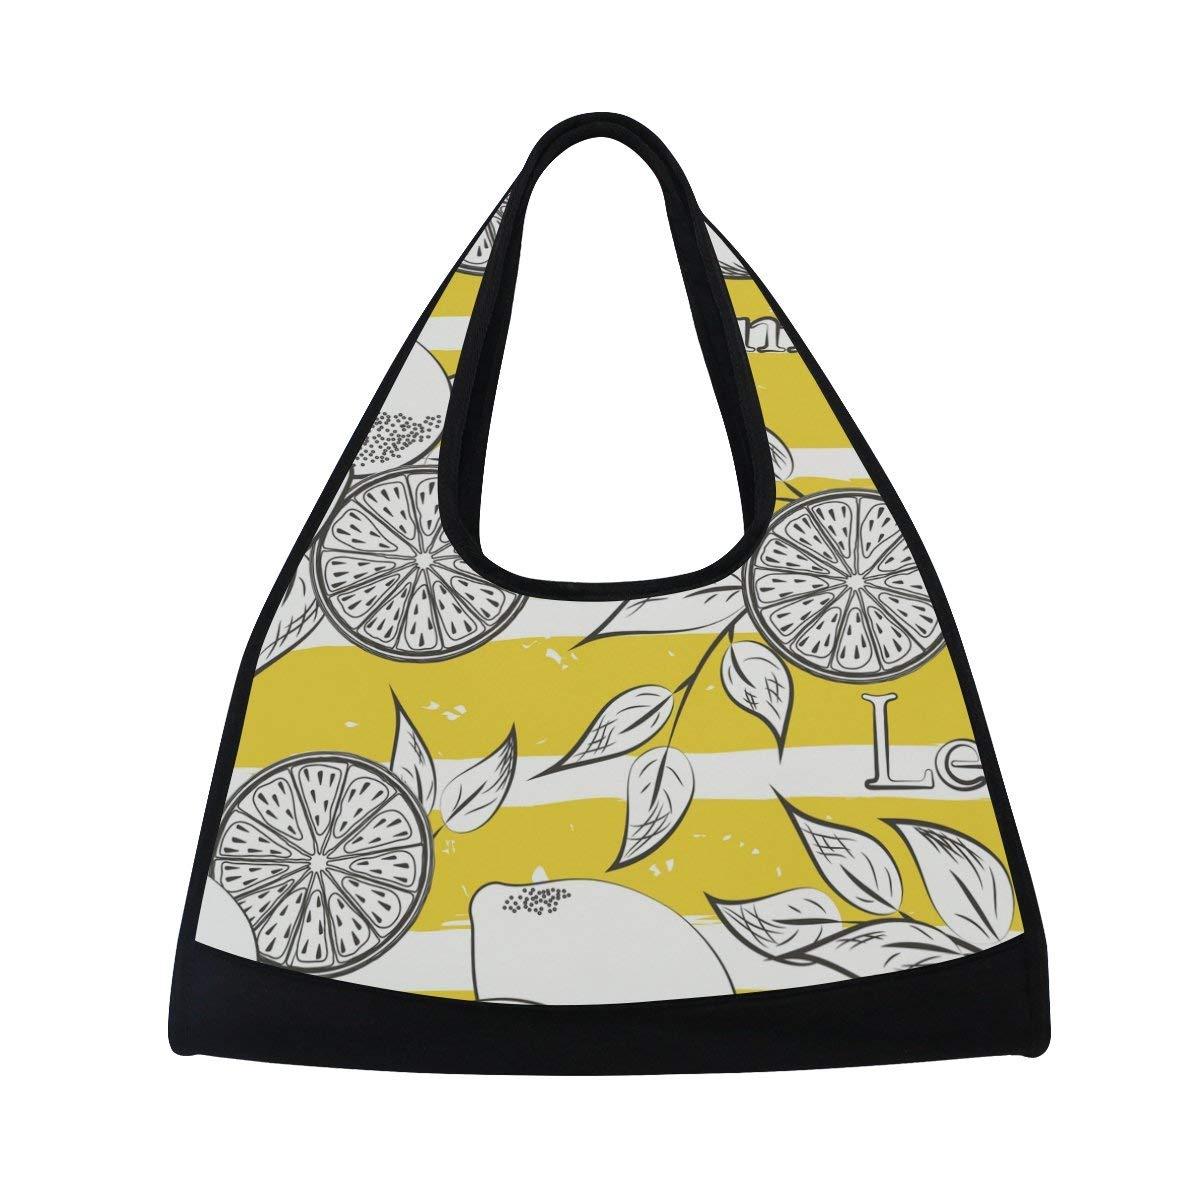 Sport Gym Bag Leaf Lemon Fruit Pattern Canvas Travel Duffel Bag